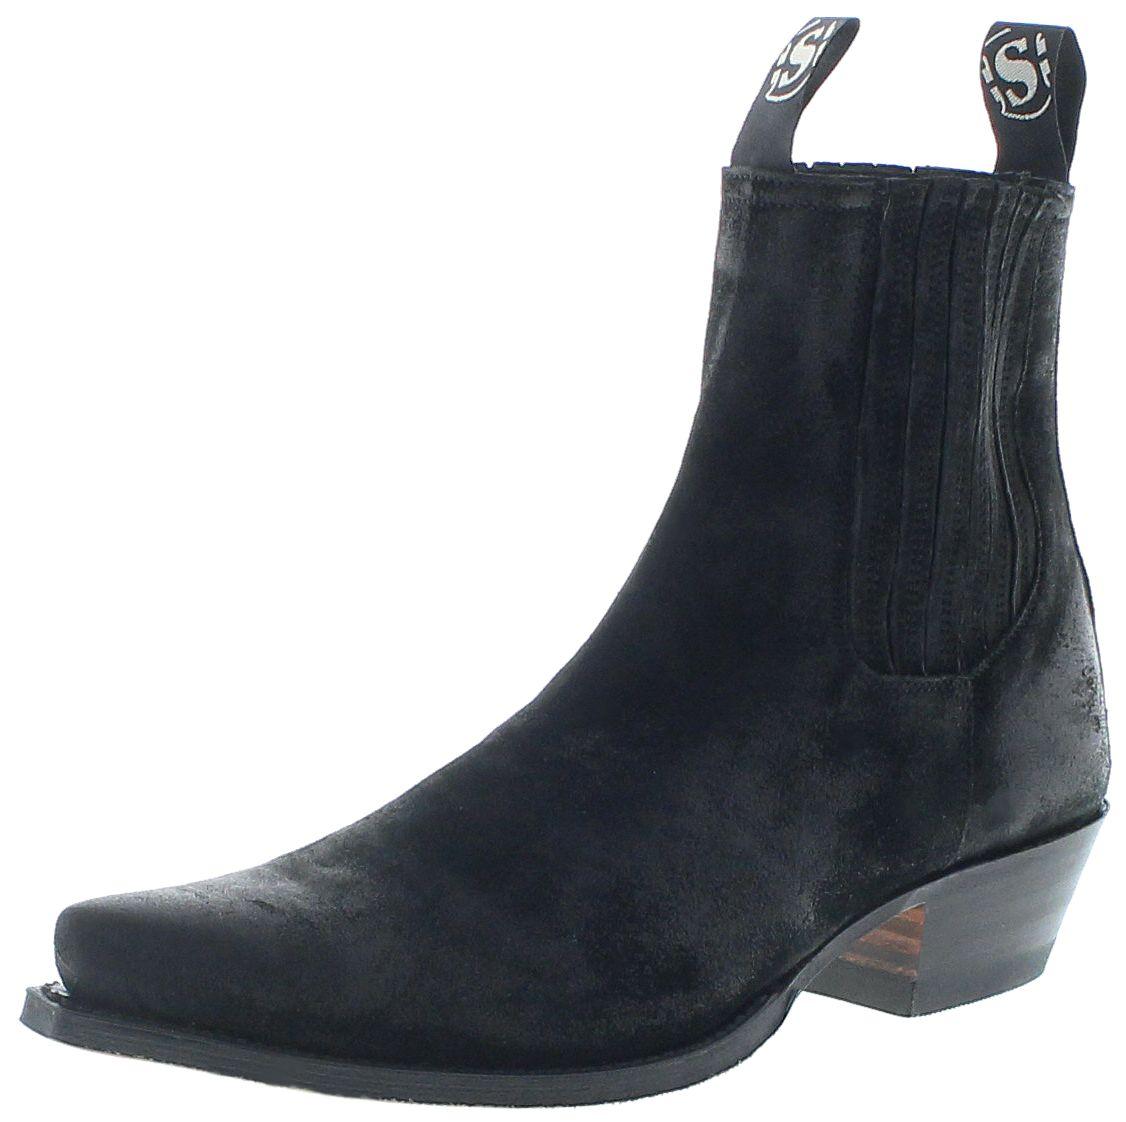 Sendra Boots 1692 Usado Negro Western Bootee - black